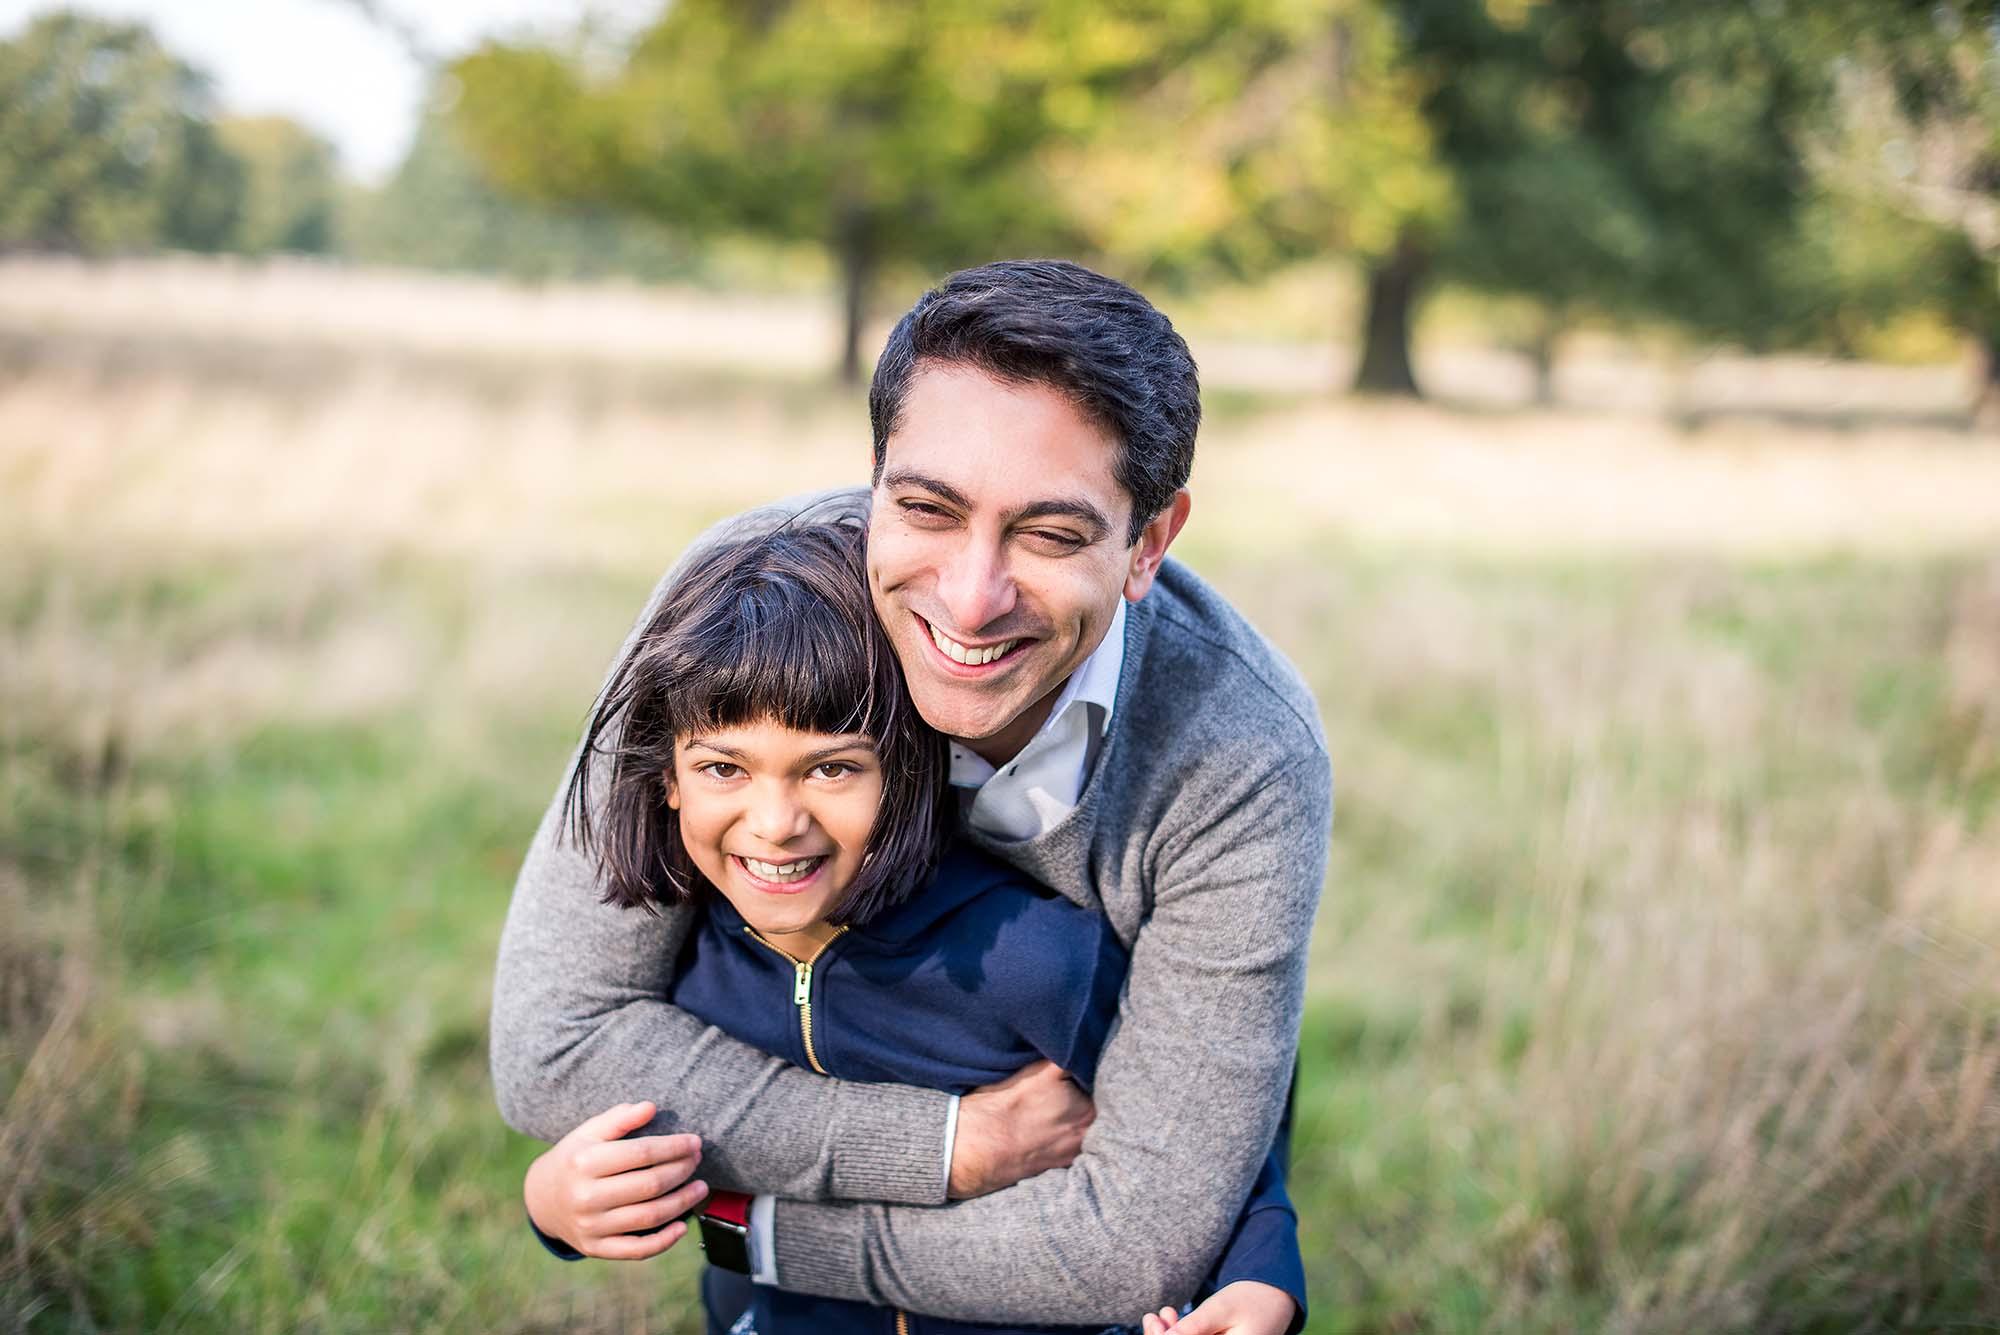 Dad hugging his daughter Surrey Photo shoot